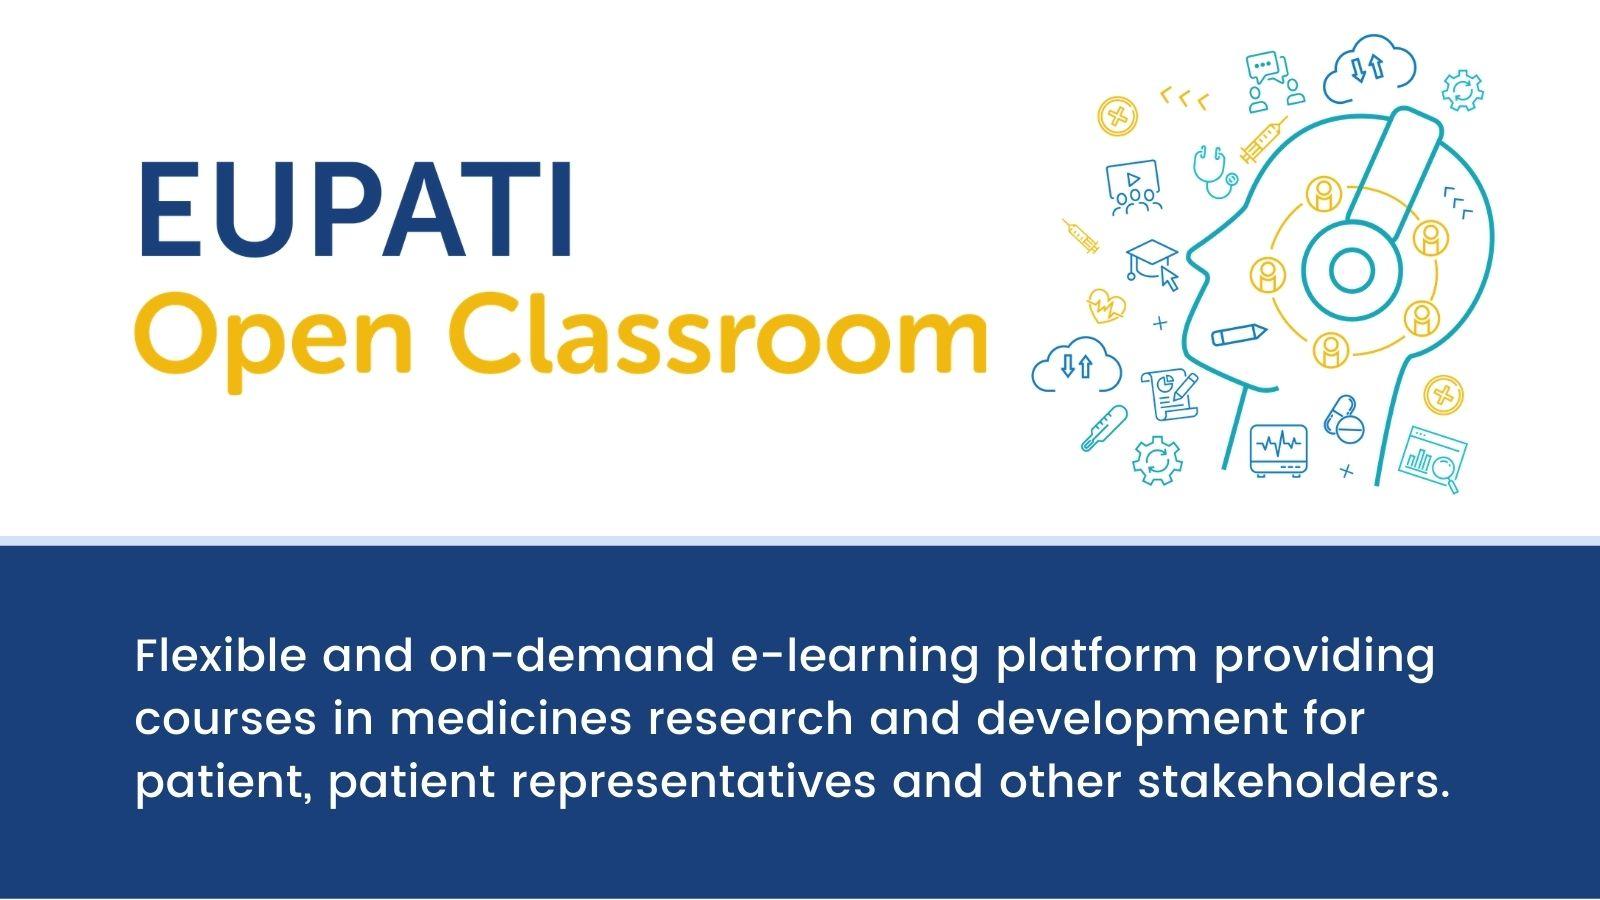 Open Classroom poster